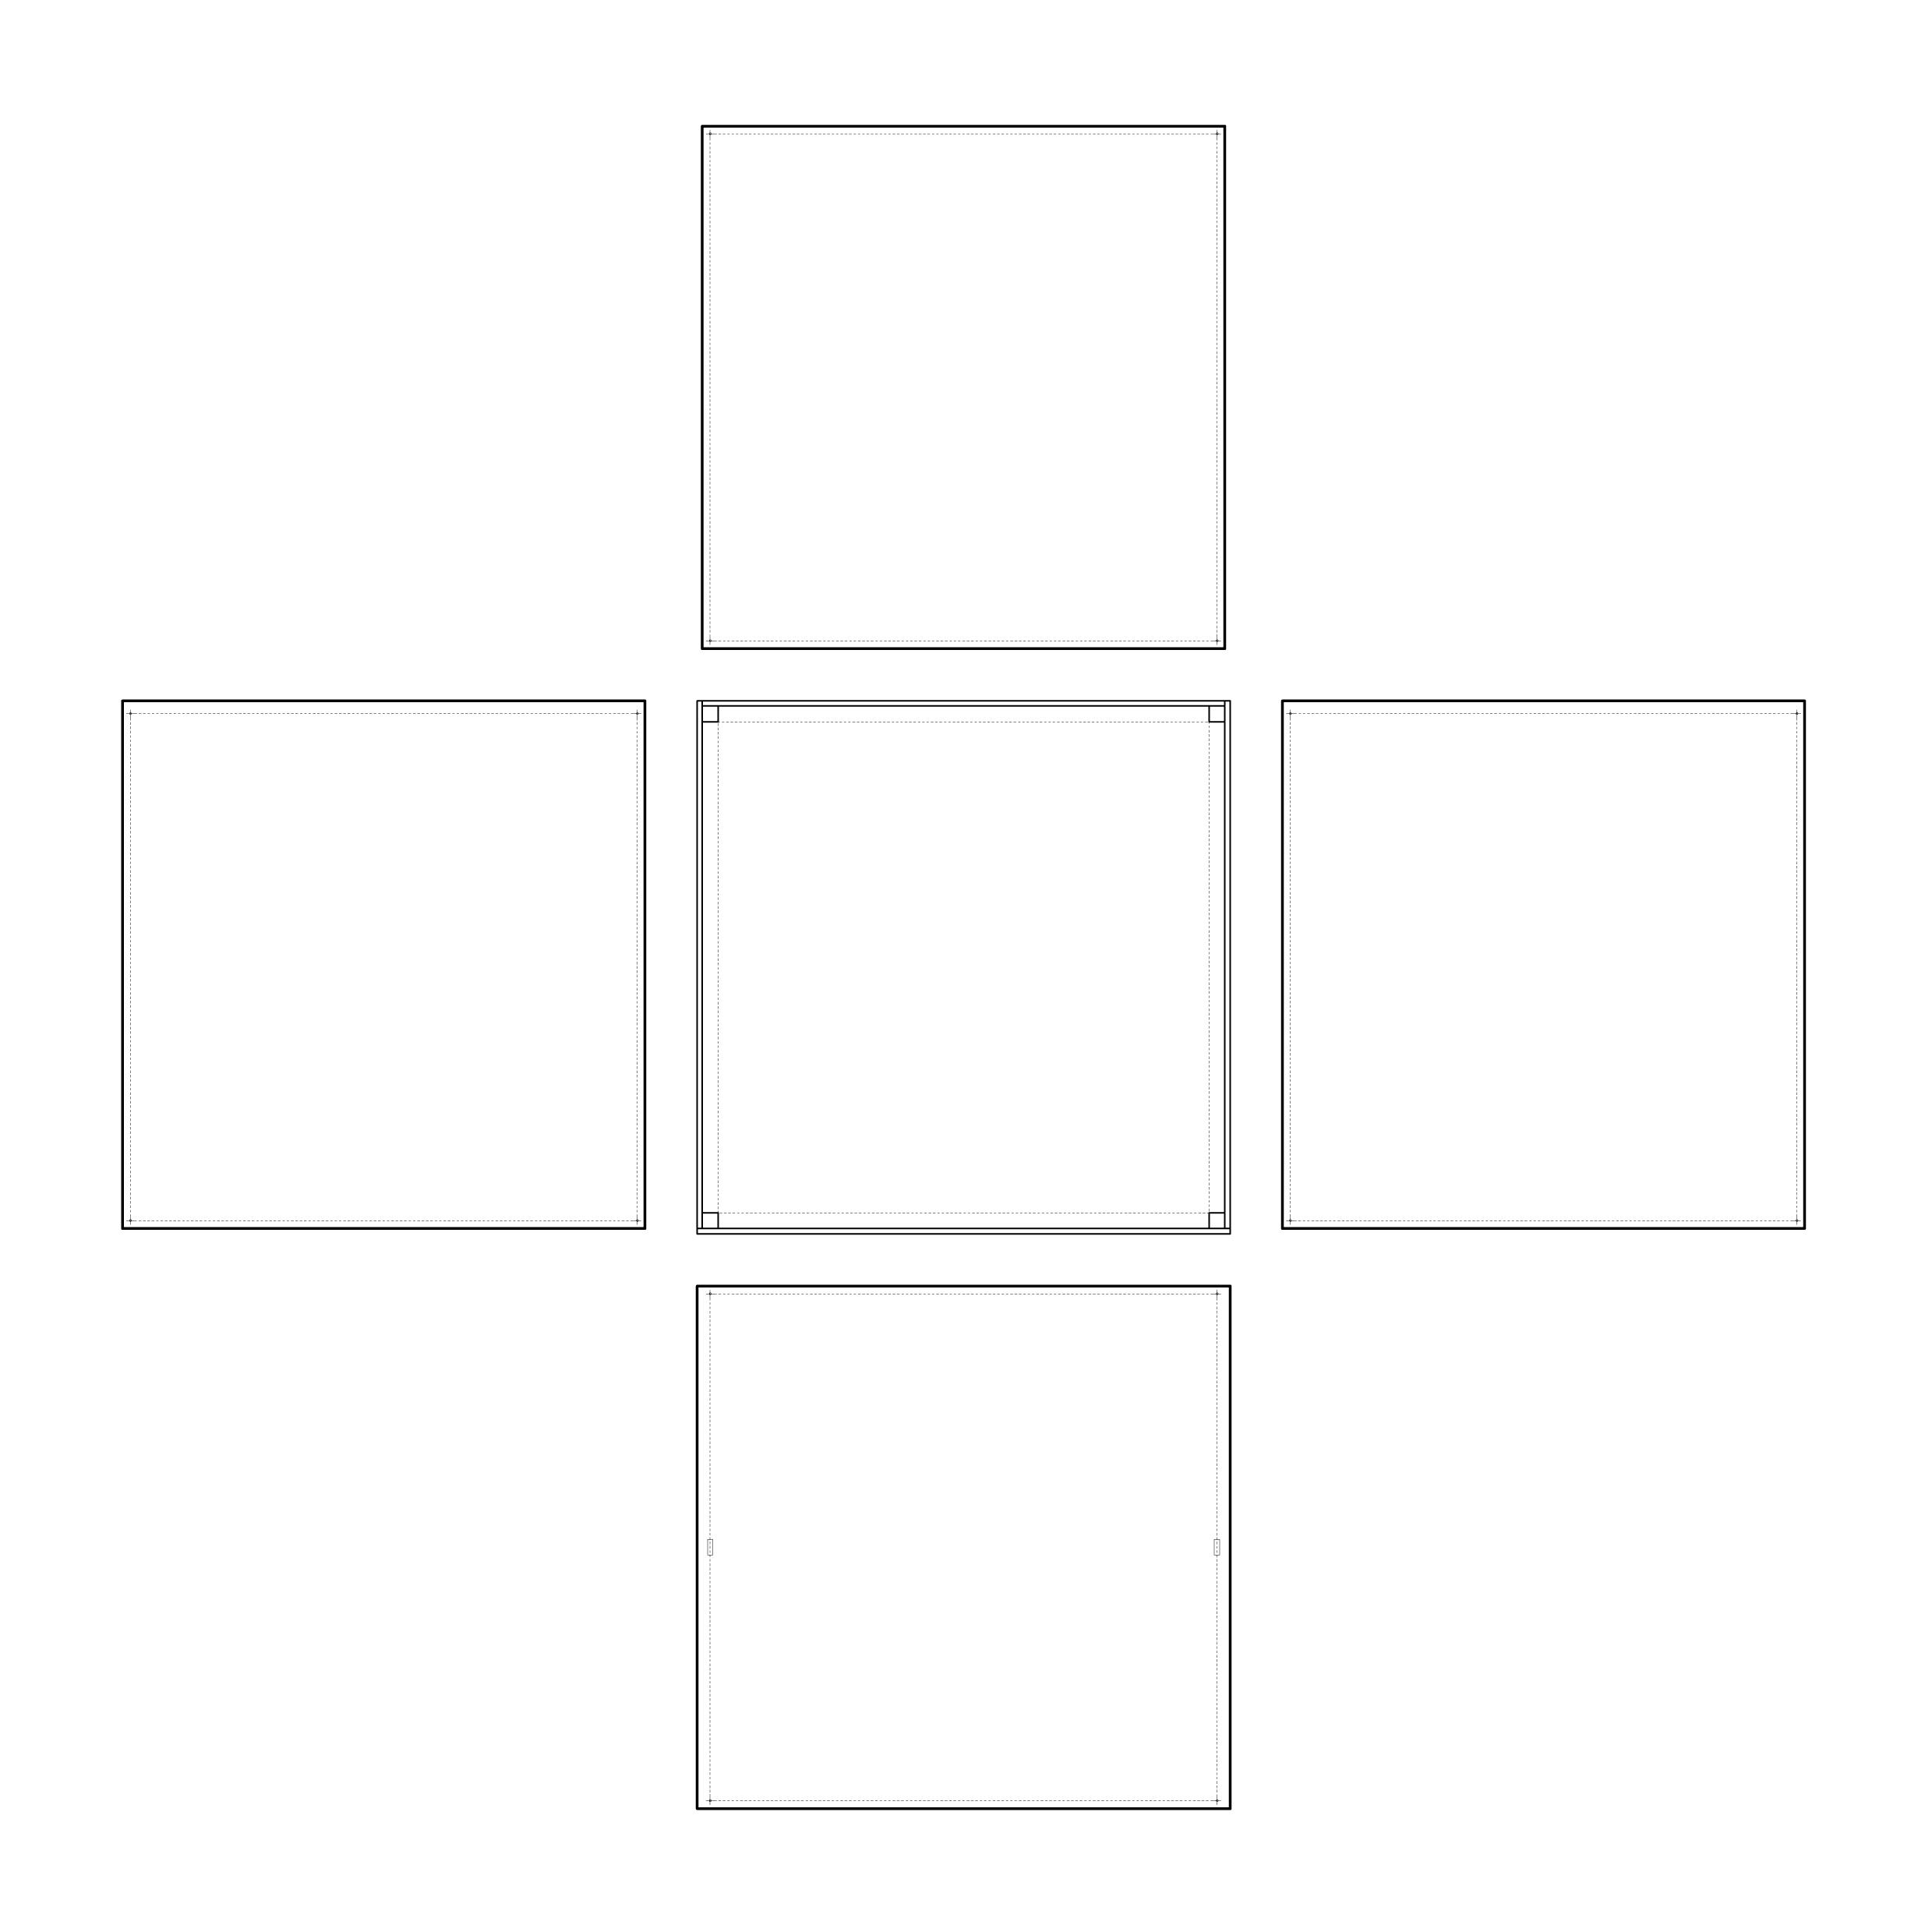 plan carré.jpg